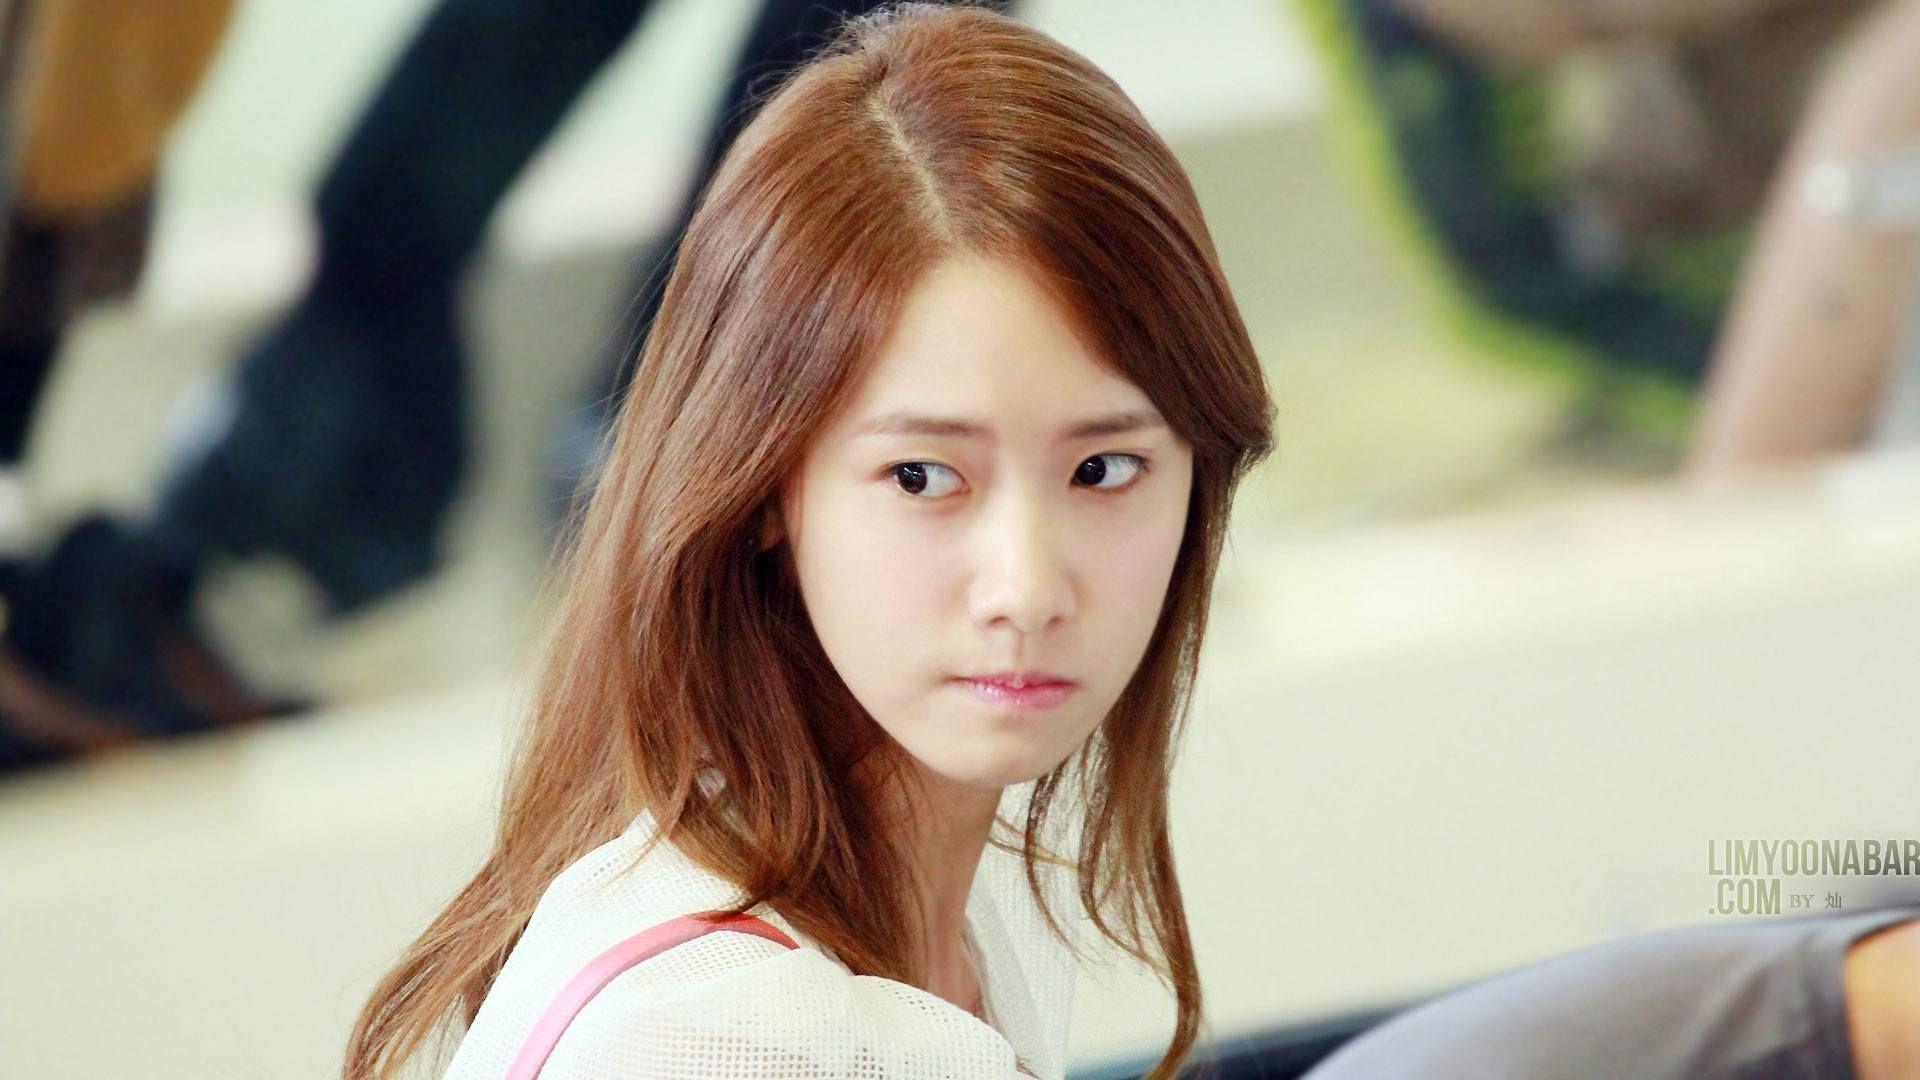 115 Idols Voted To Determine The Prettiest Girl Group Member Koreaboo Yoona Girl Group Yoona Snsd